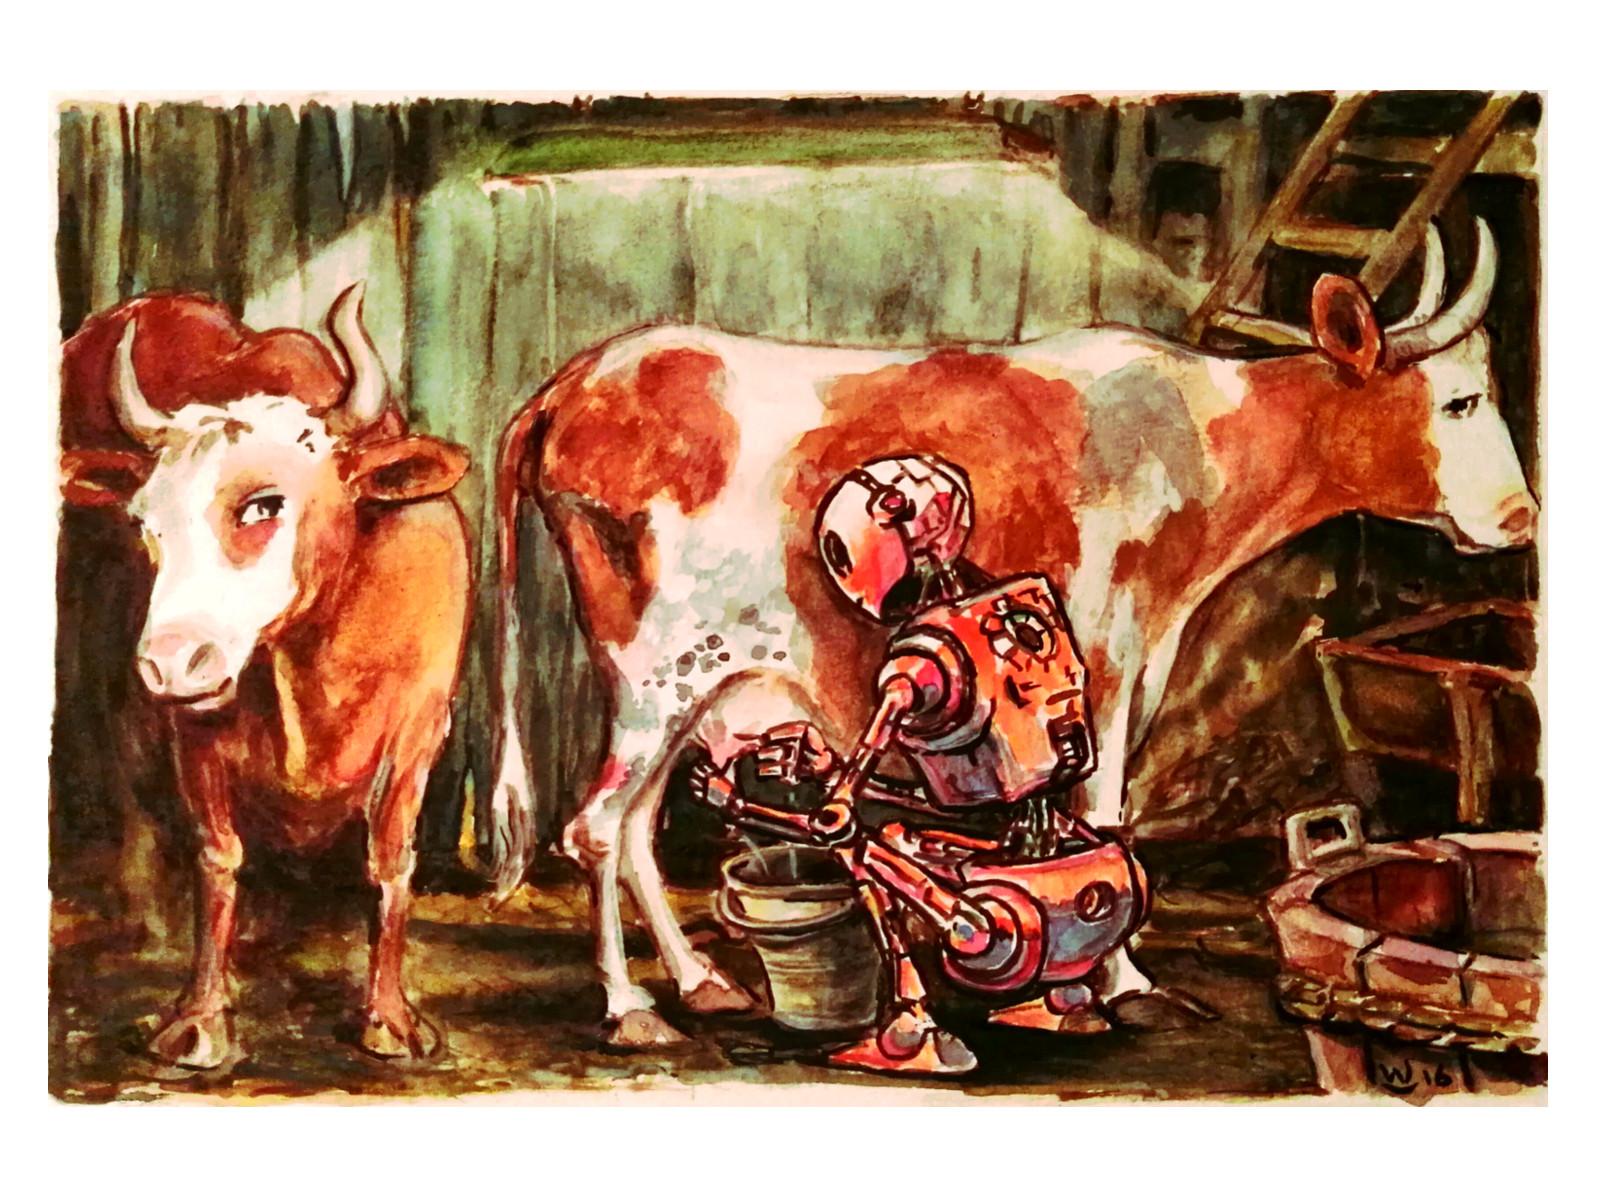 milkingthecow